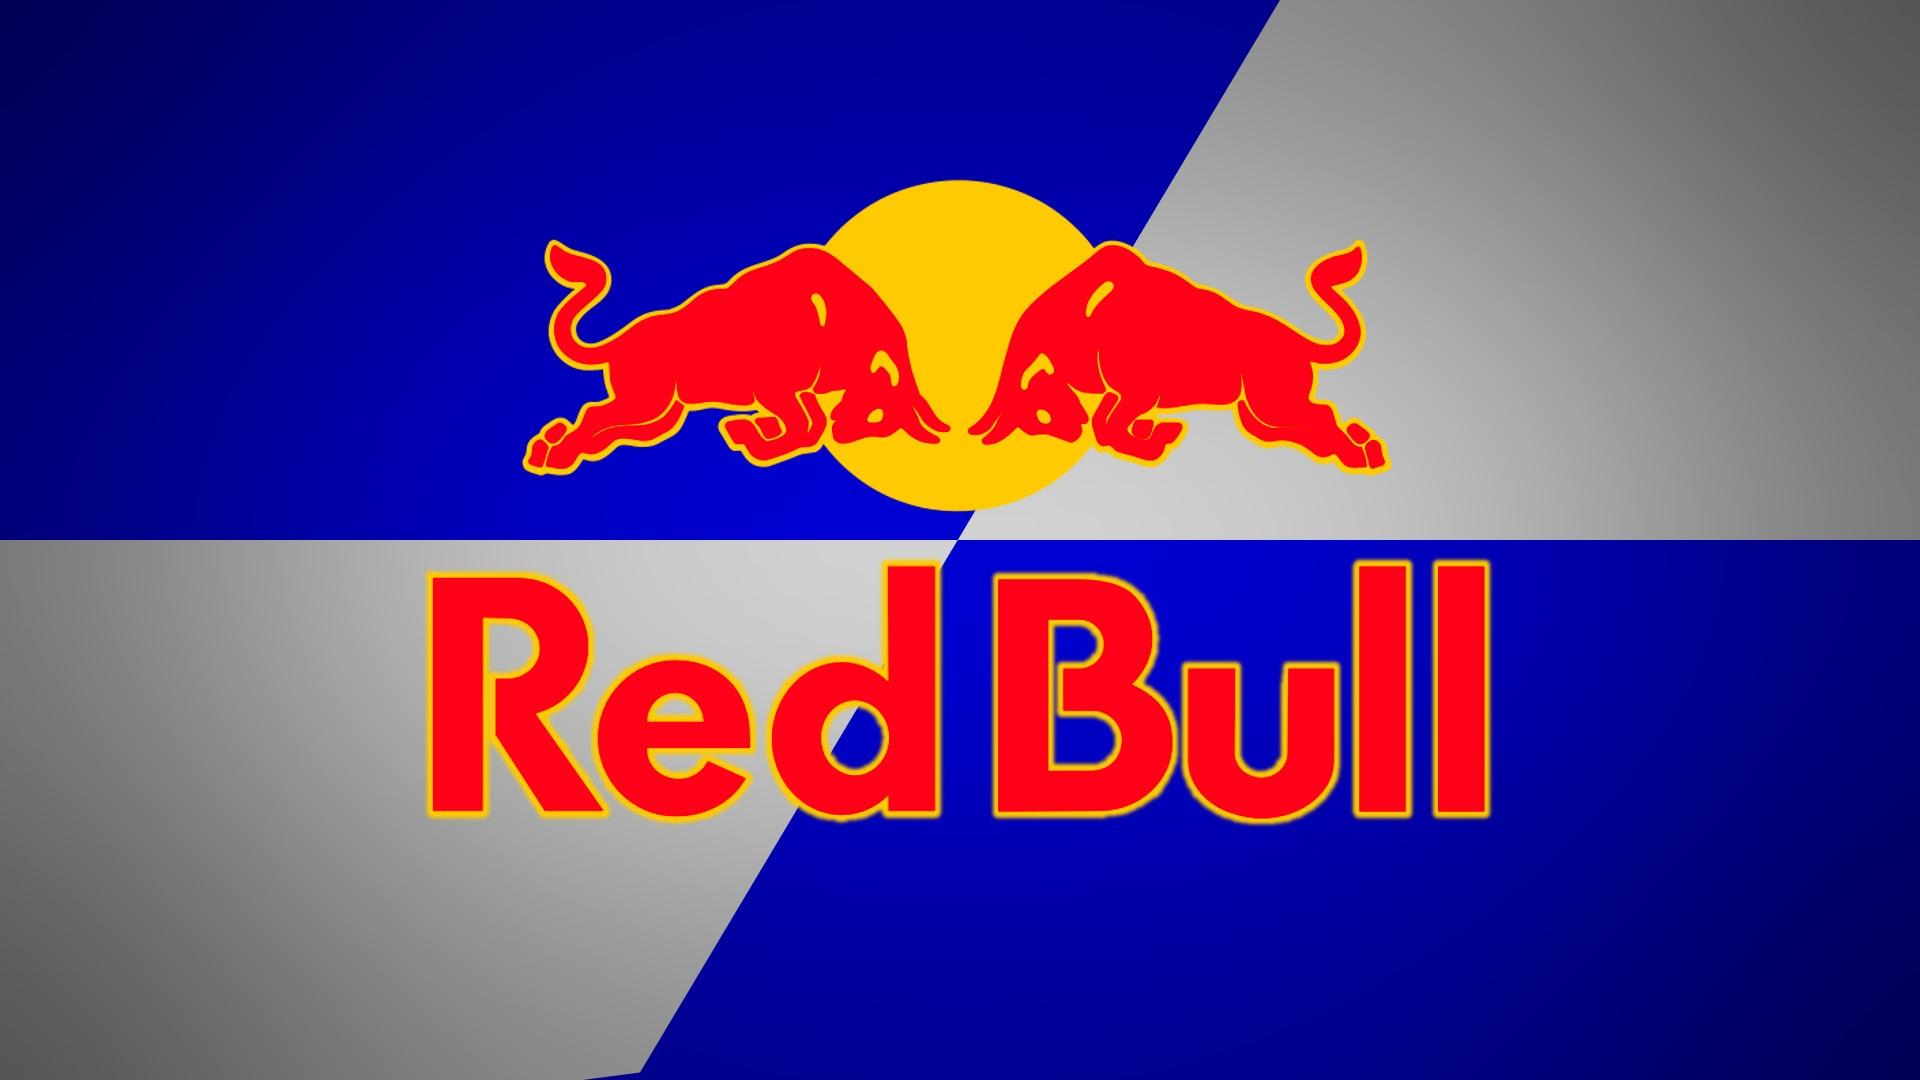 Red Bull Culture Marketing Specialist - Distribution Partner Recruitment